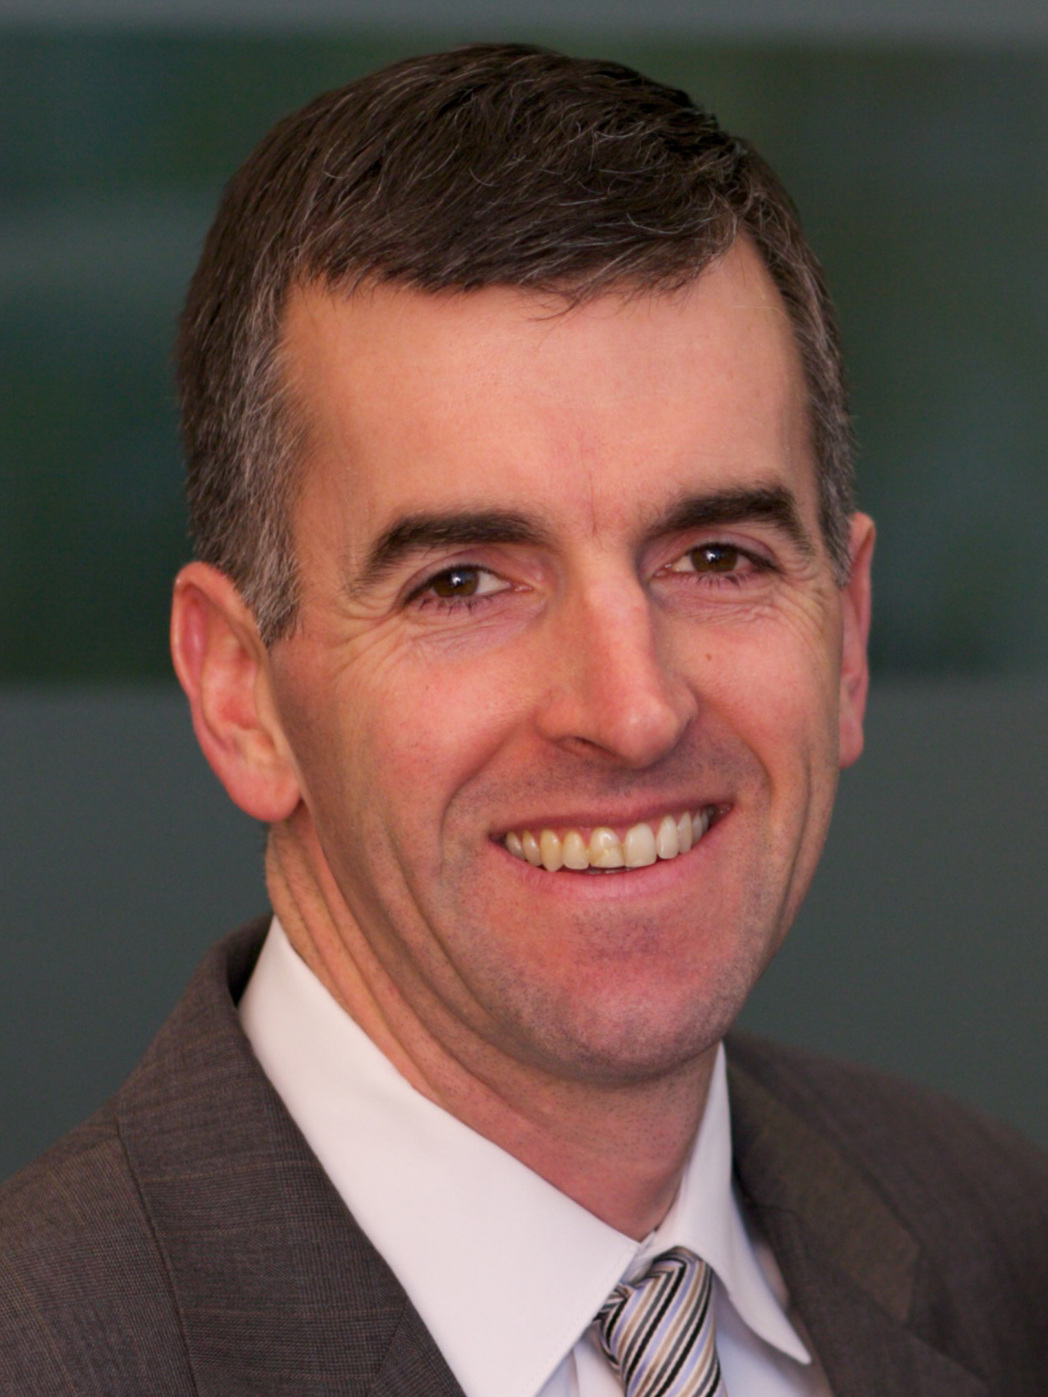 Matt Sullivan - Ward 7 Commissioner